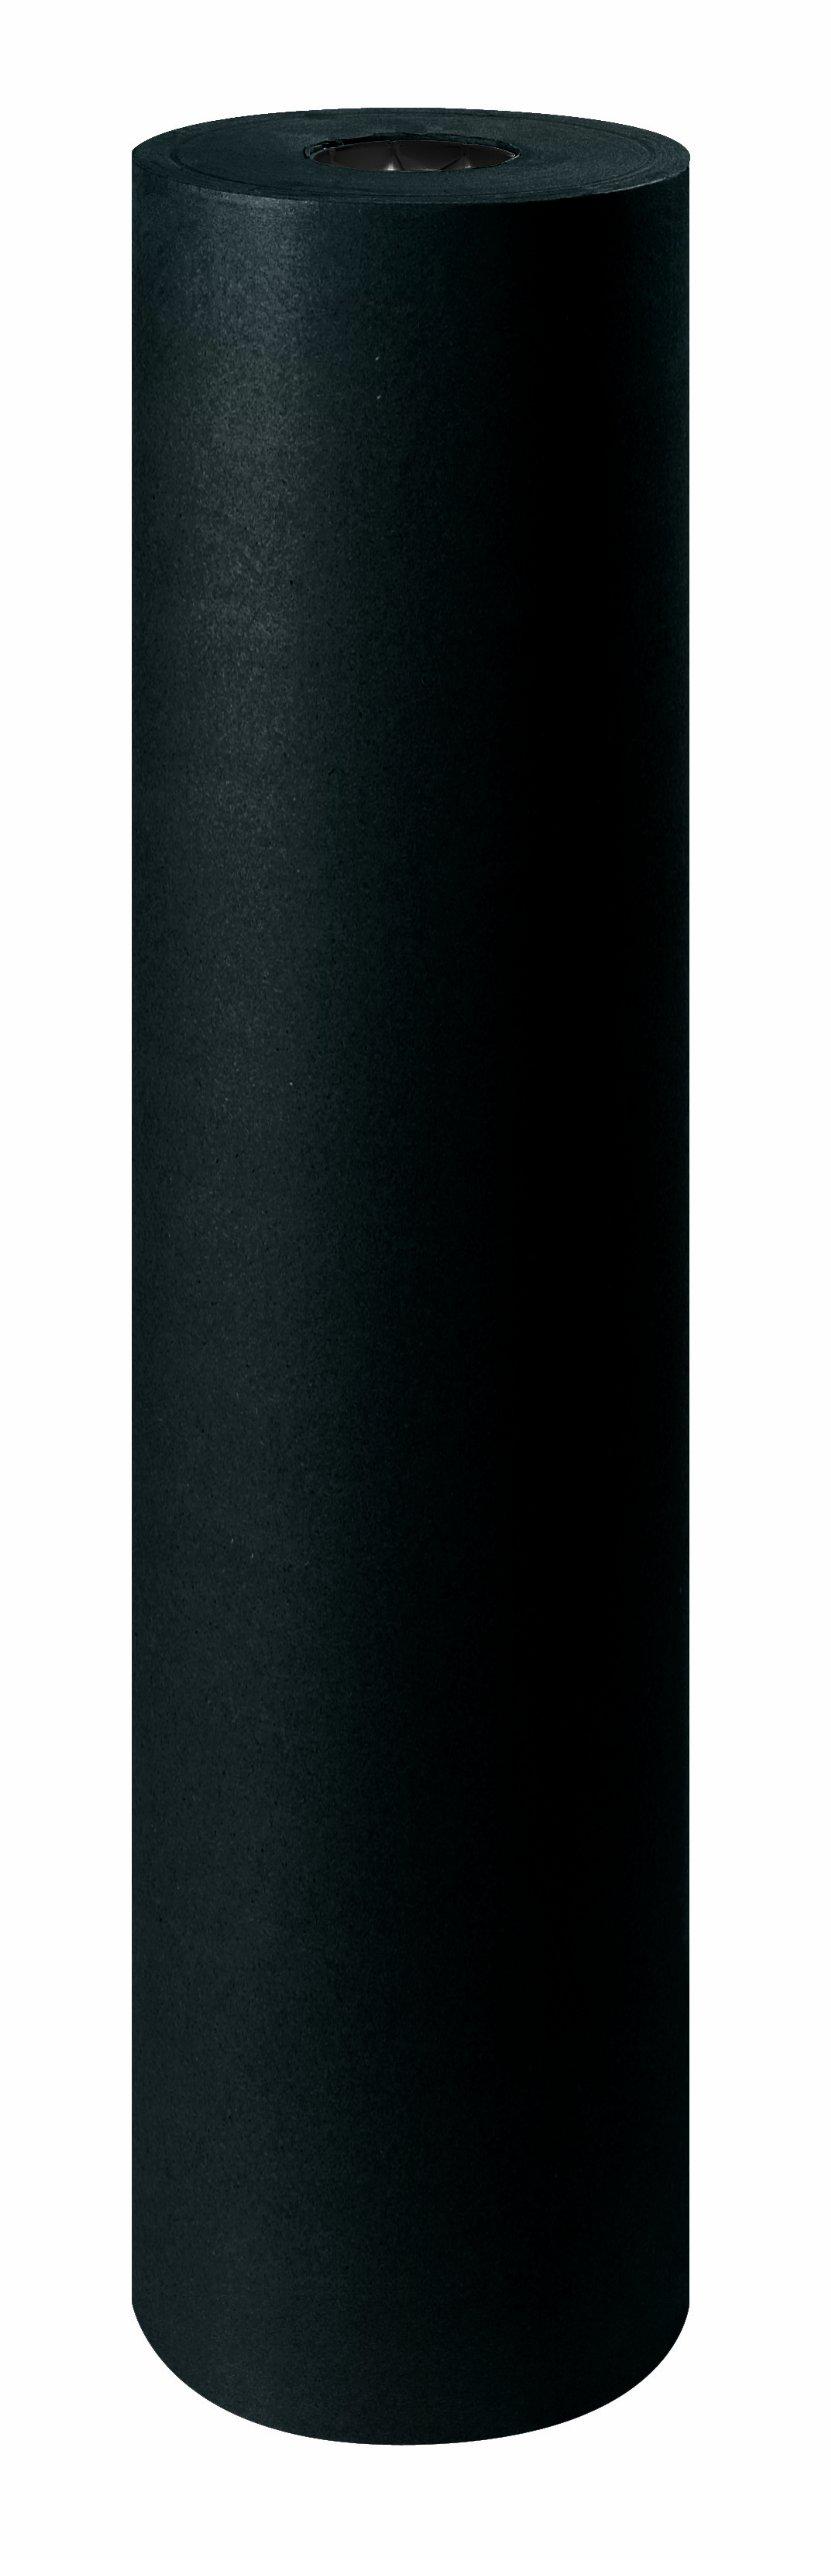 Aviditi KP2450BK 50# Kraft Paper Rolls, 24'', Black